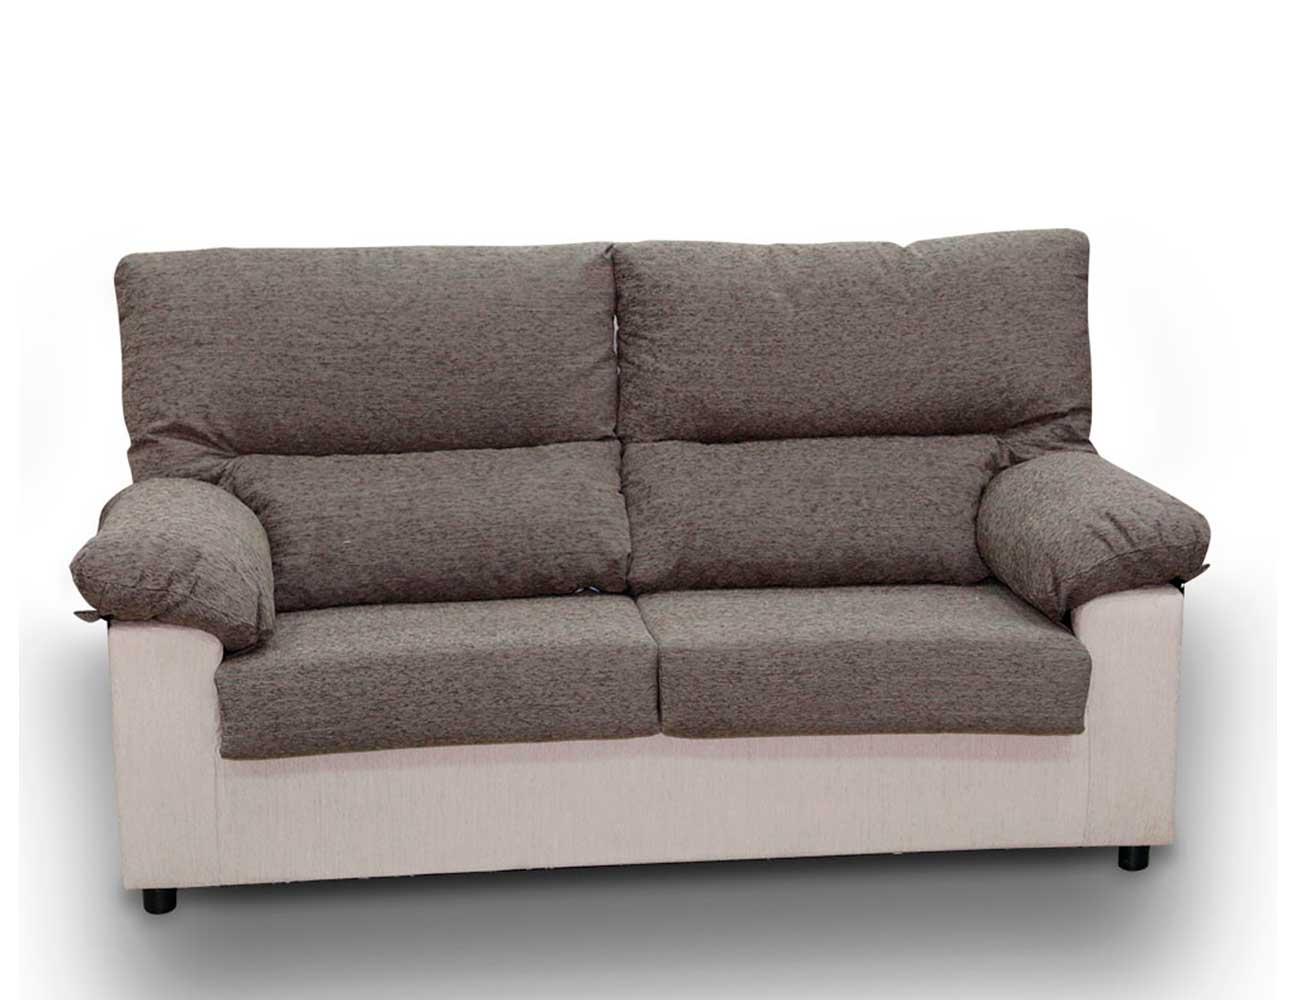 Sofa 3 plazas barato15